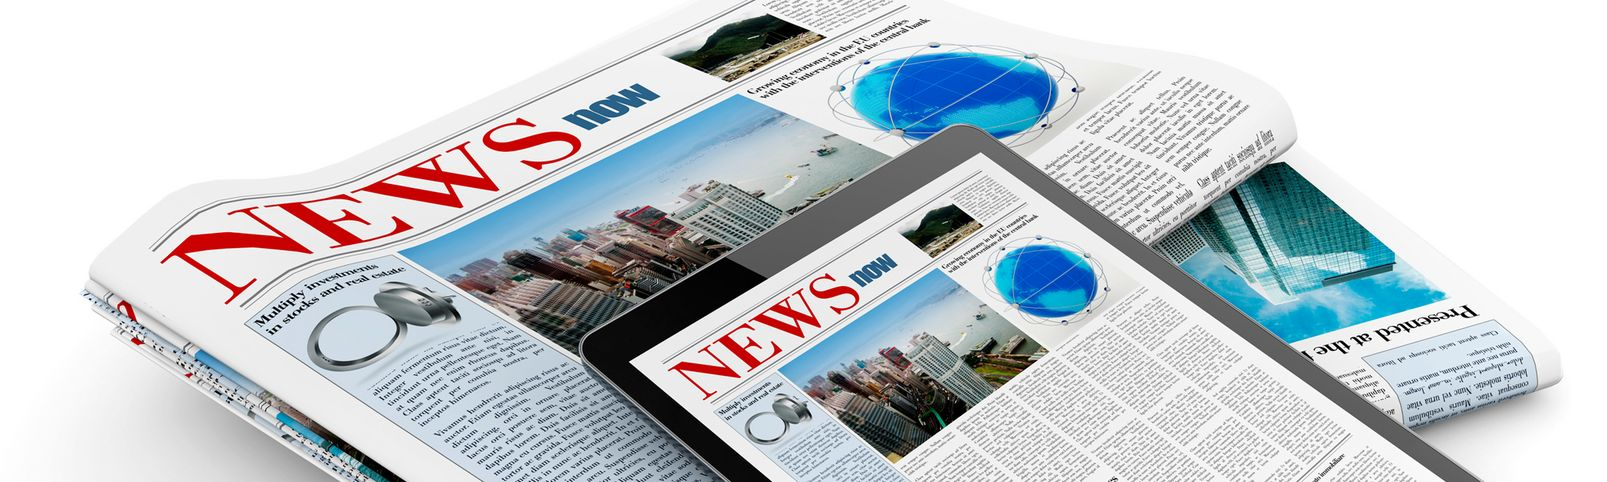 Amberg News